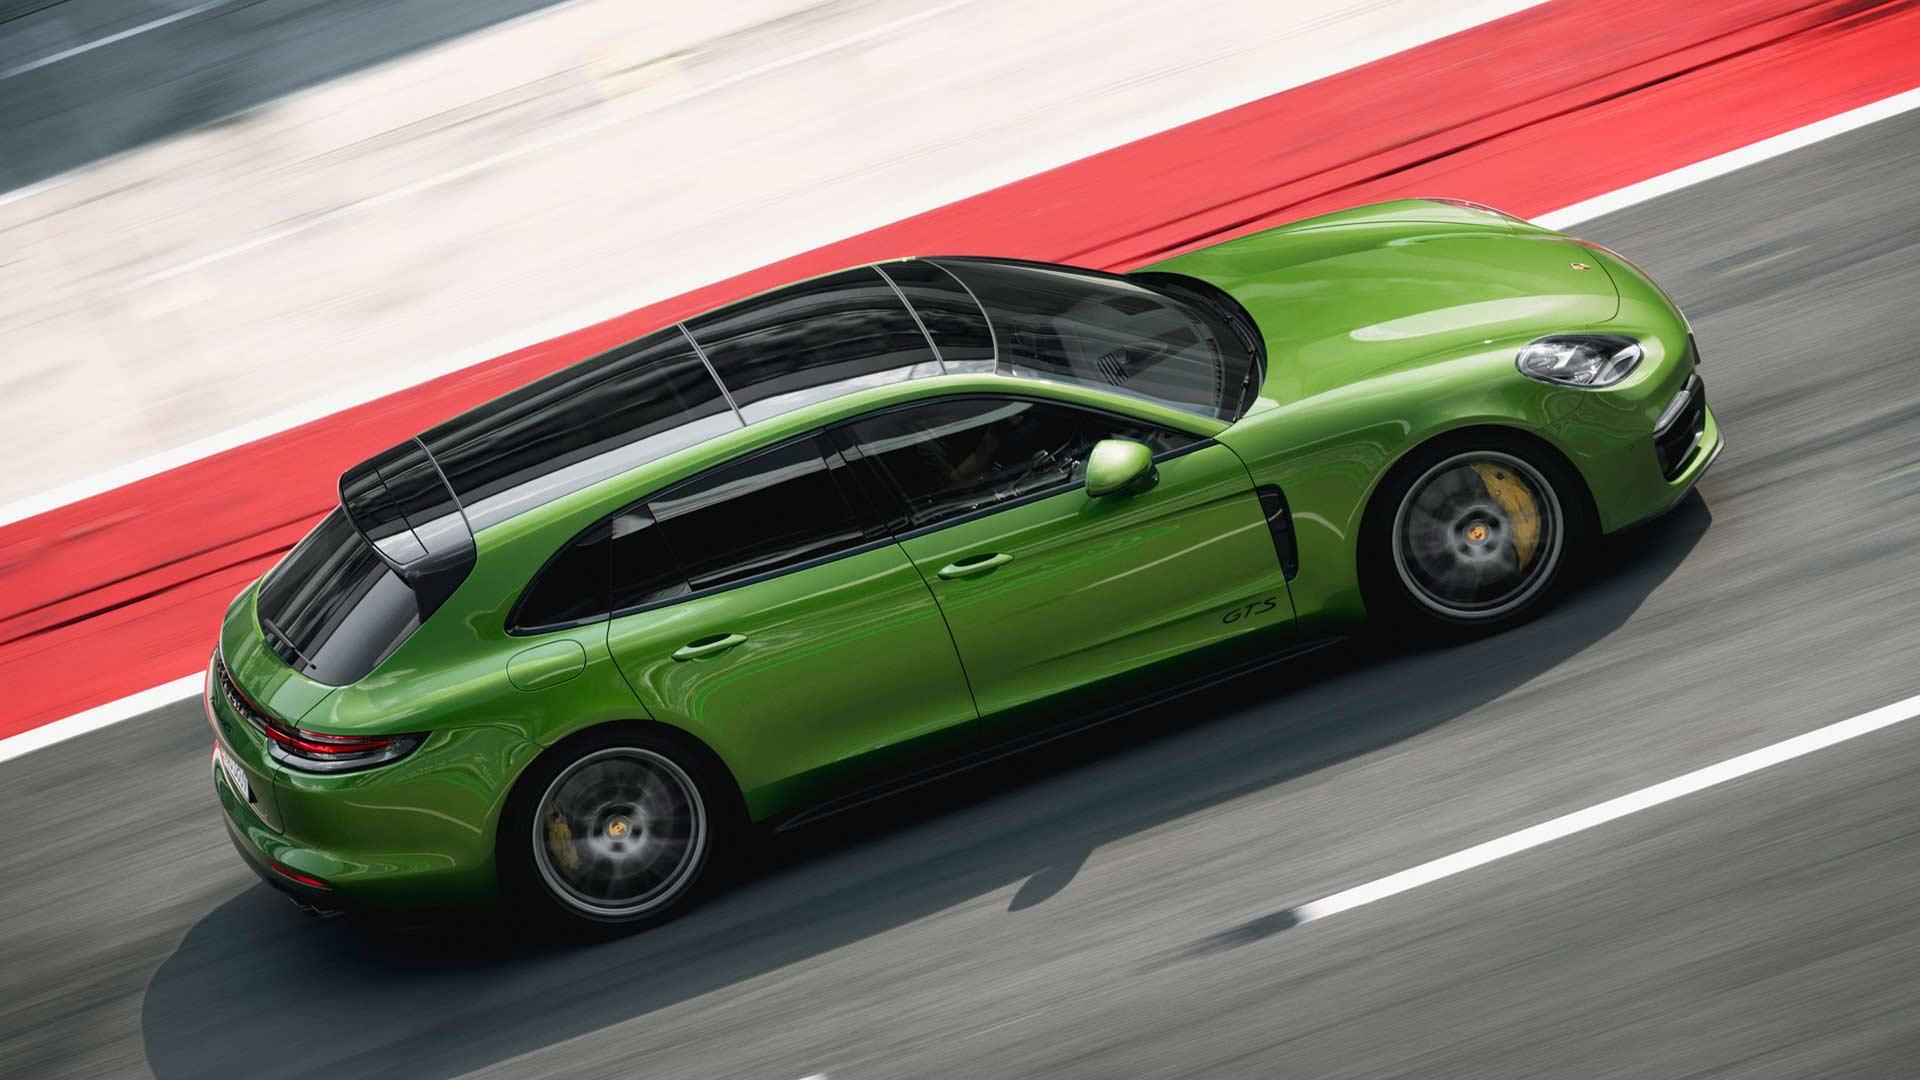 2018-2nd-generation-Porsche-Panamera-GTS-Sport-Turismo